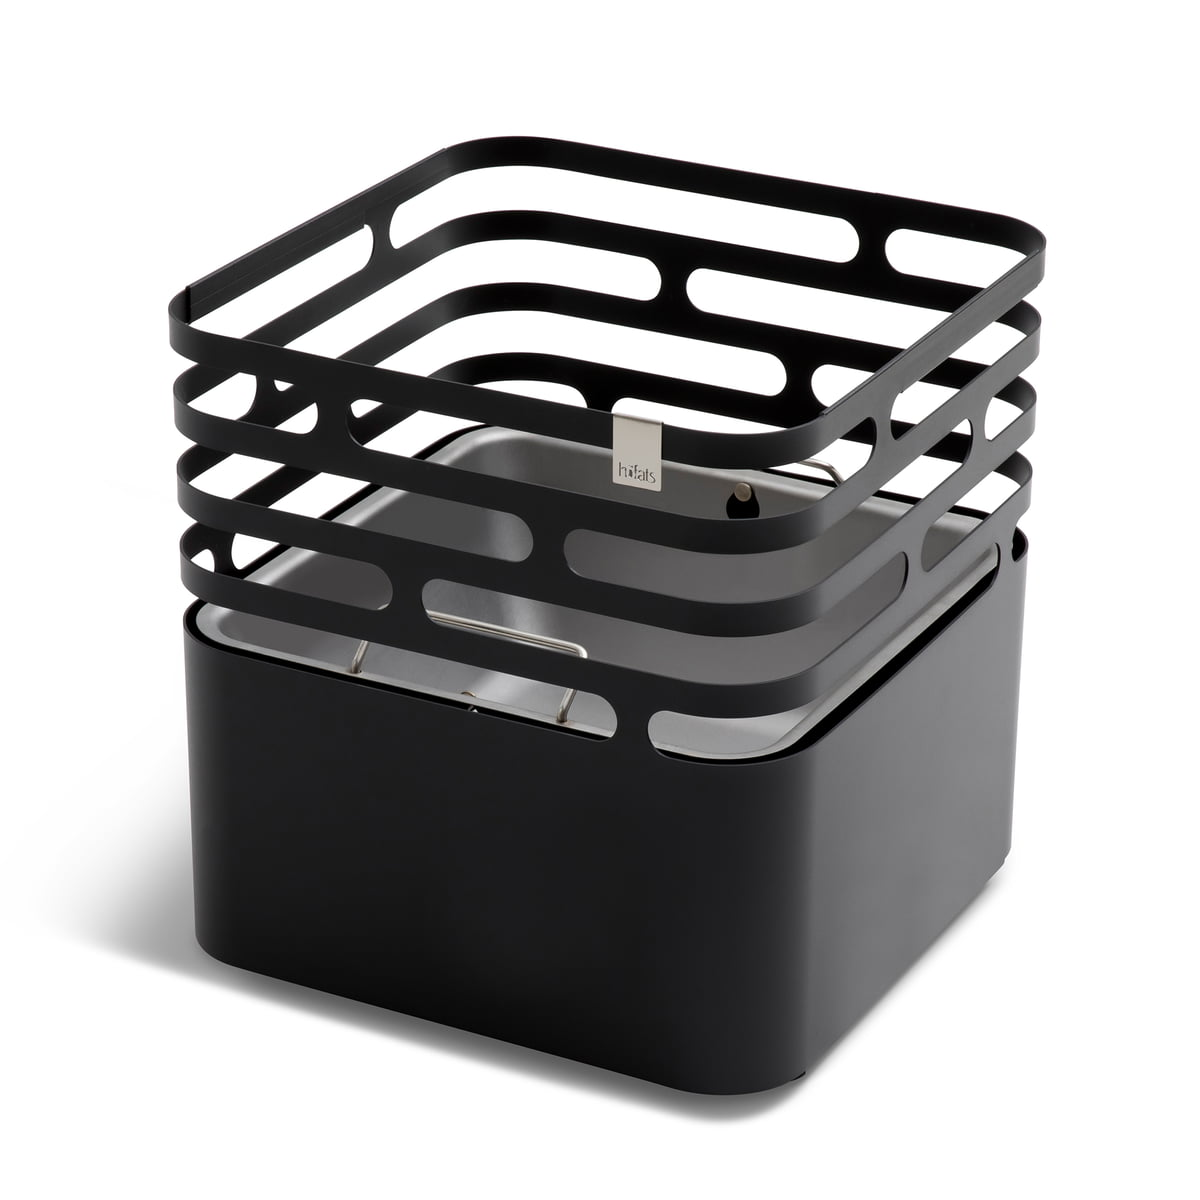 Brasero grill tabouret table d'appoint noir